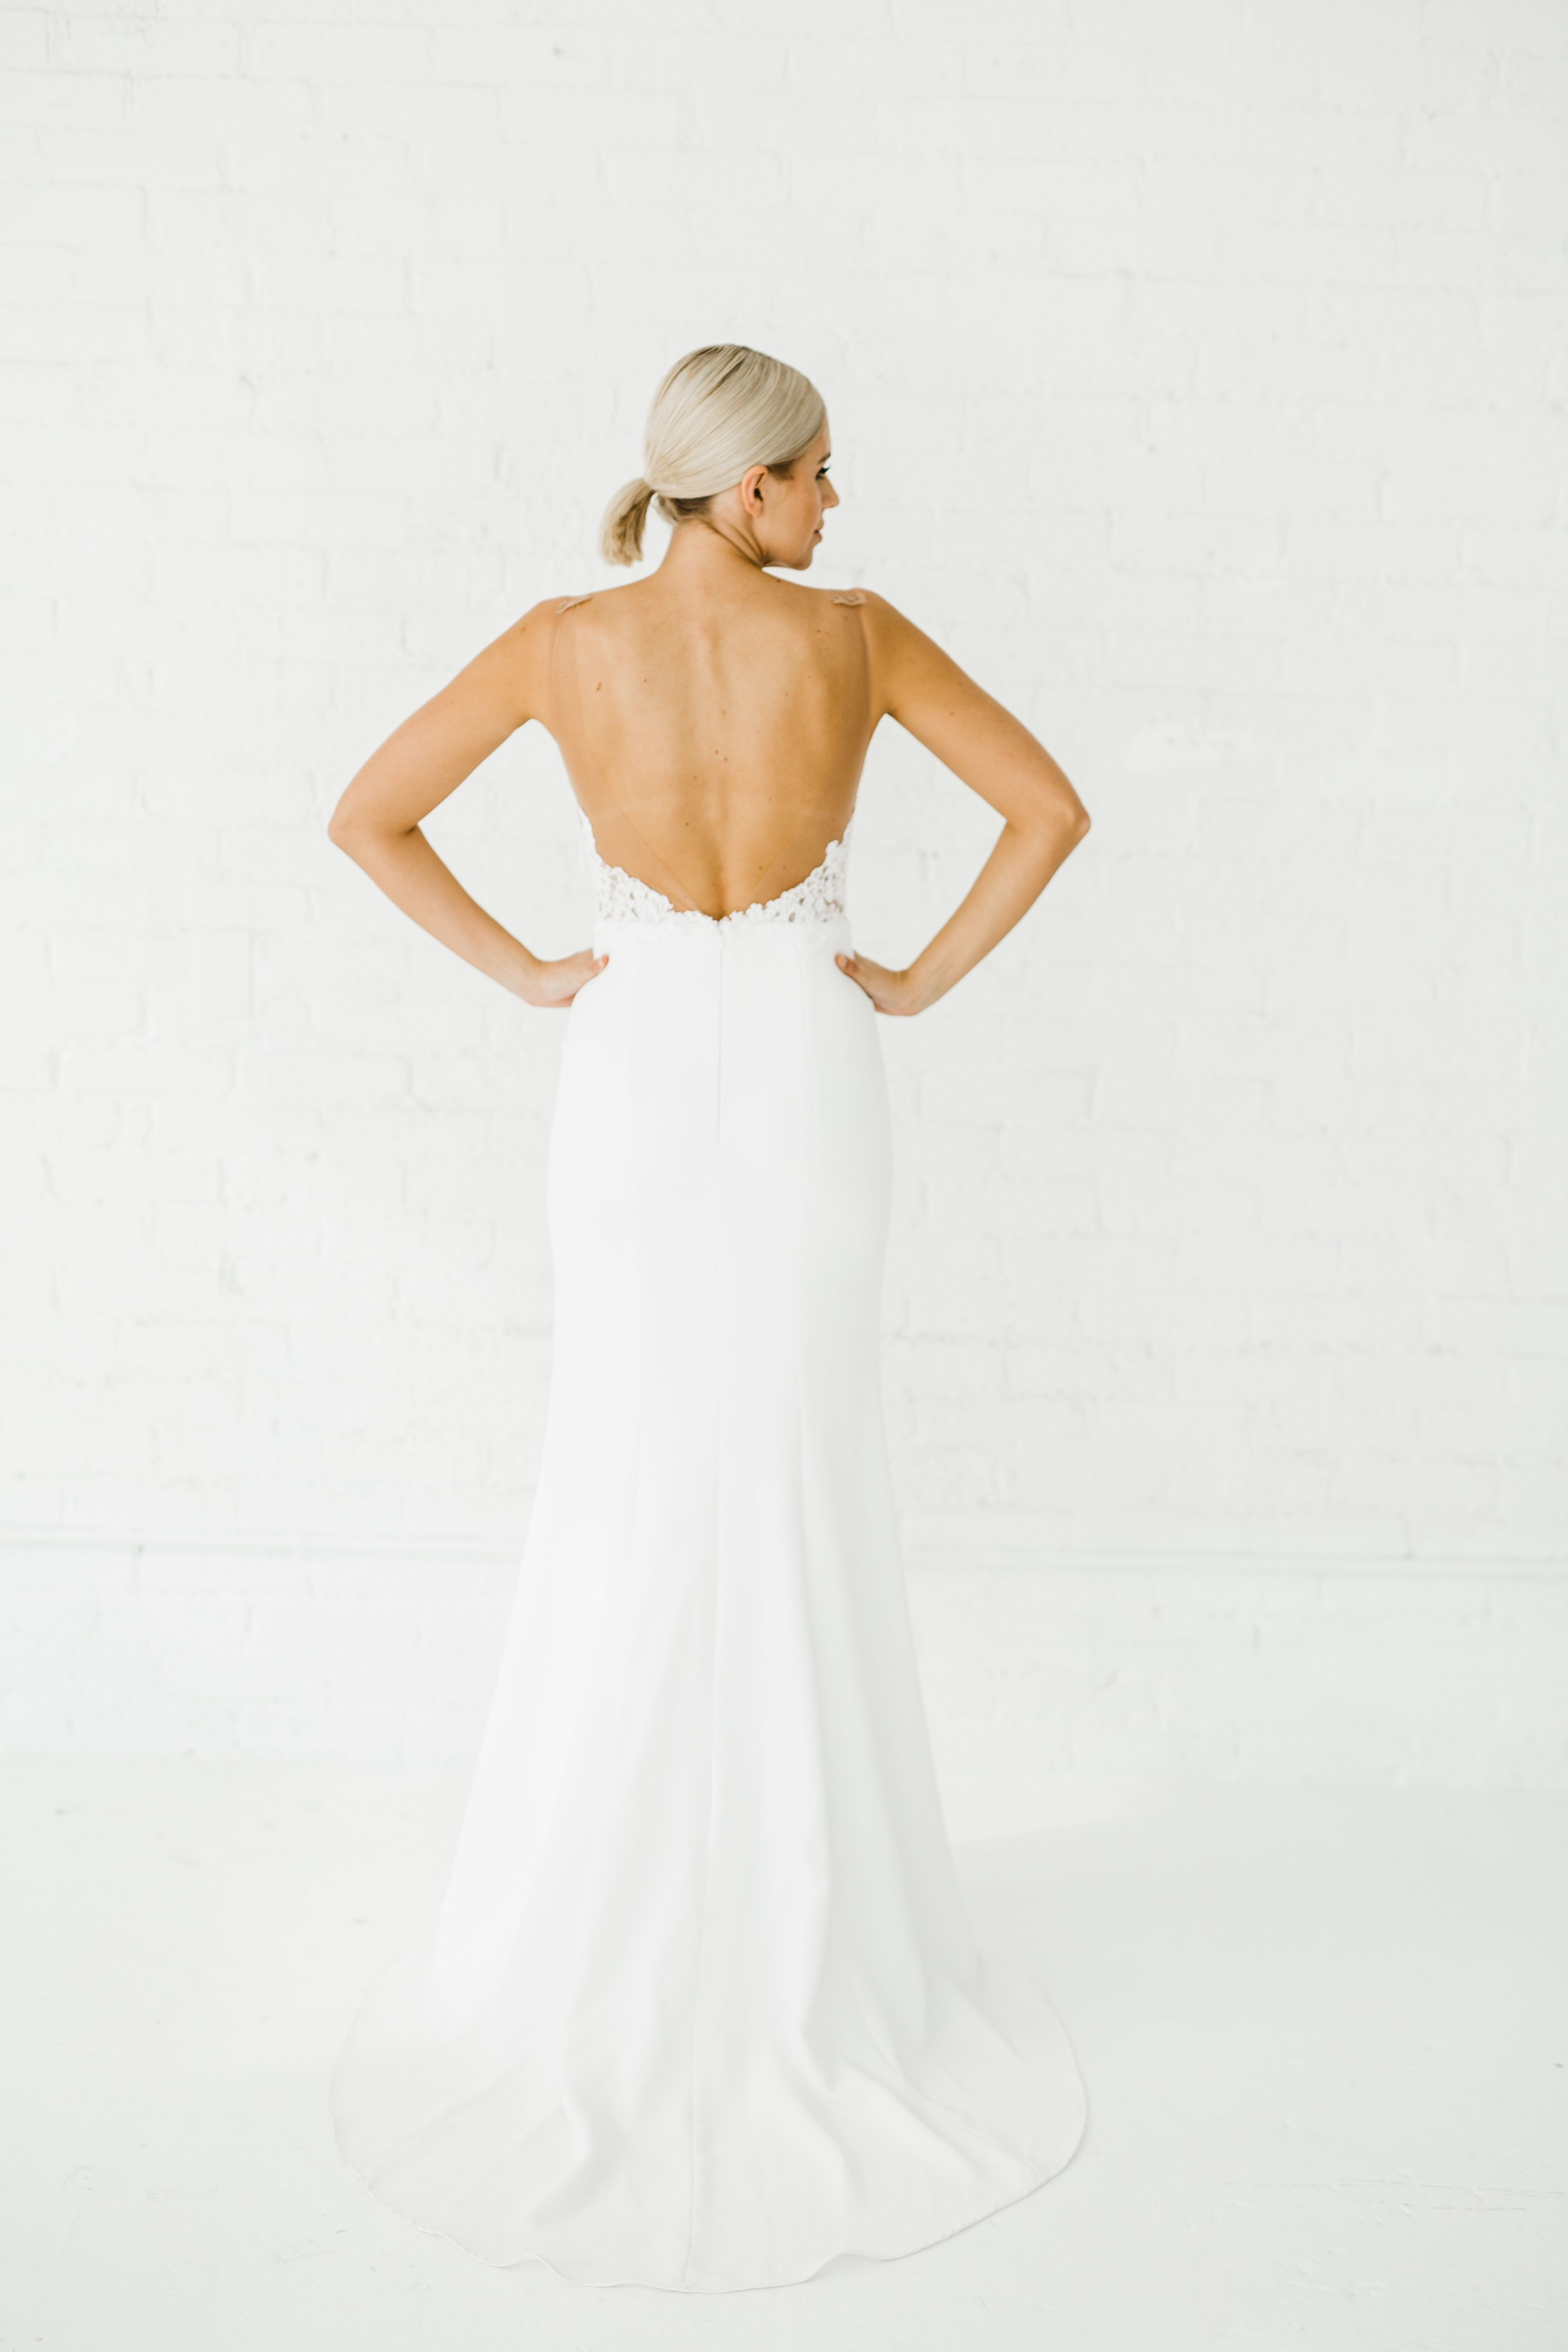 Rose Alyssa Kristin Chicago Wedding Dress Designer Agnes Rasek Photography Crepe Wedding Dress Minimalist Wedding Dresses Fitted Wedding Dress